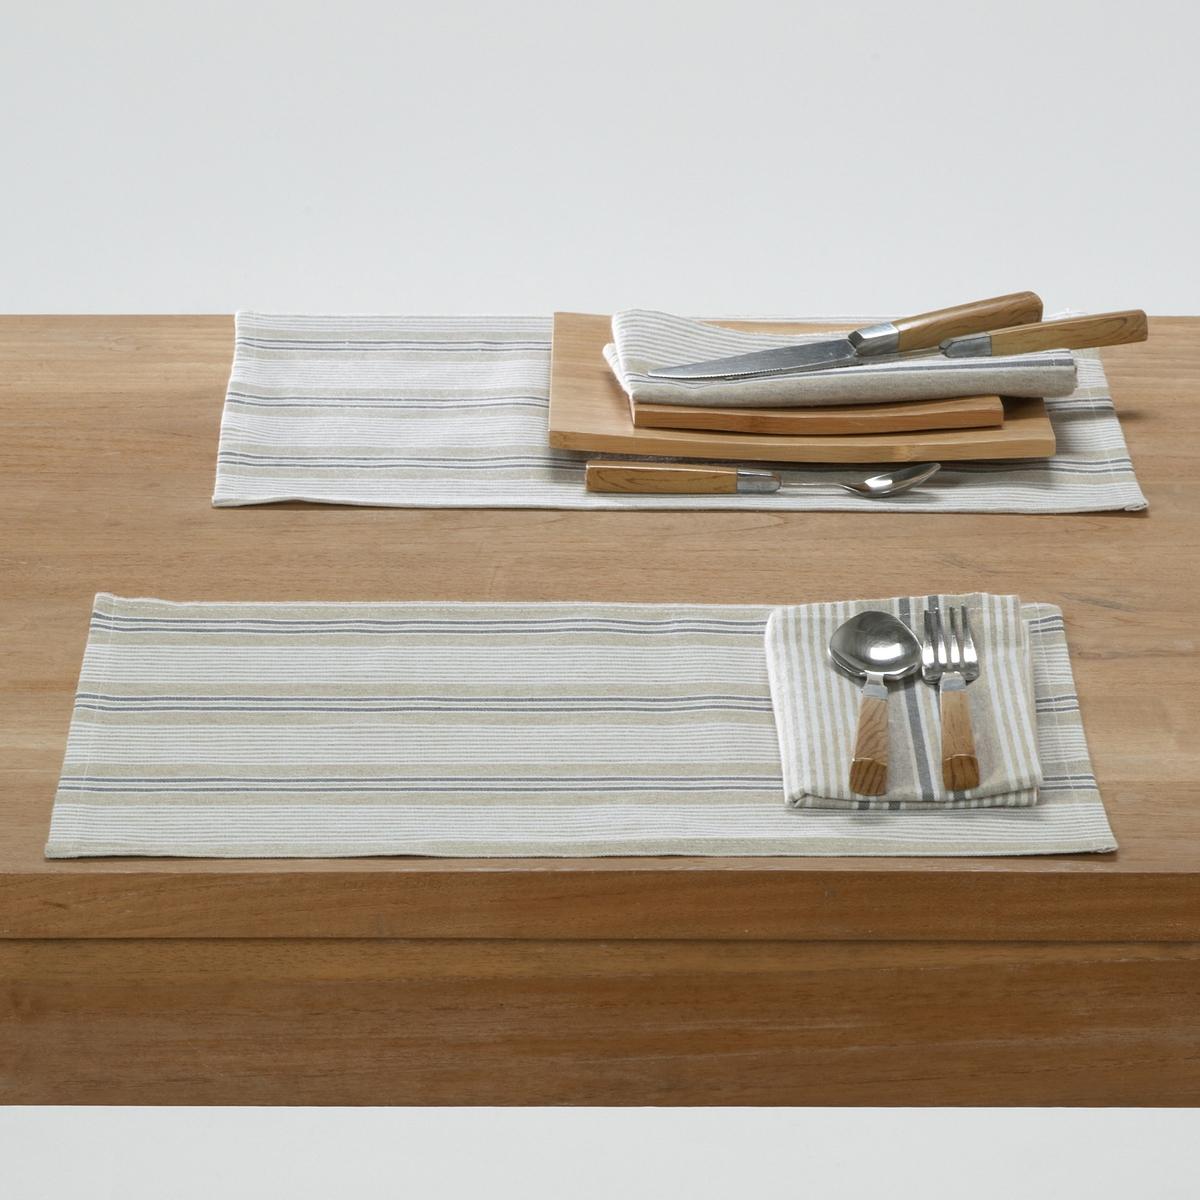 Комплект из 2-х салфеток под столовый прибор,  FERM. от La Redoute